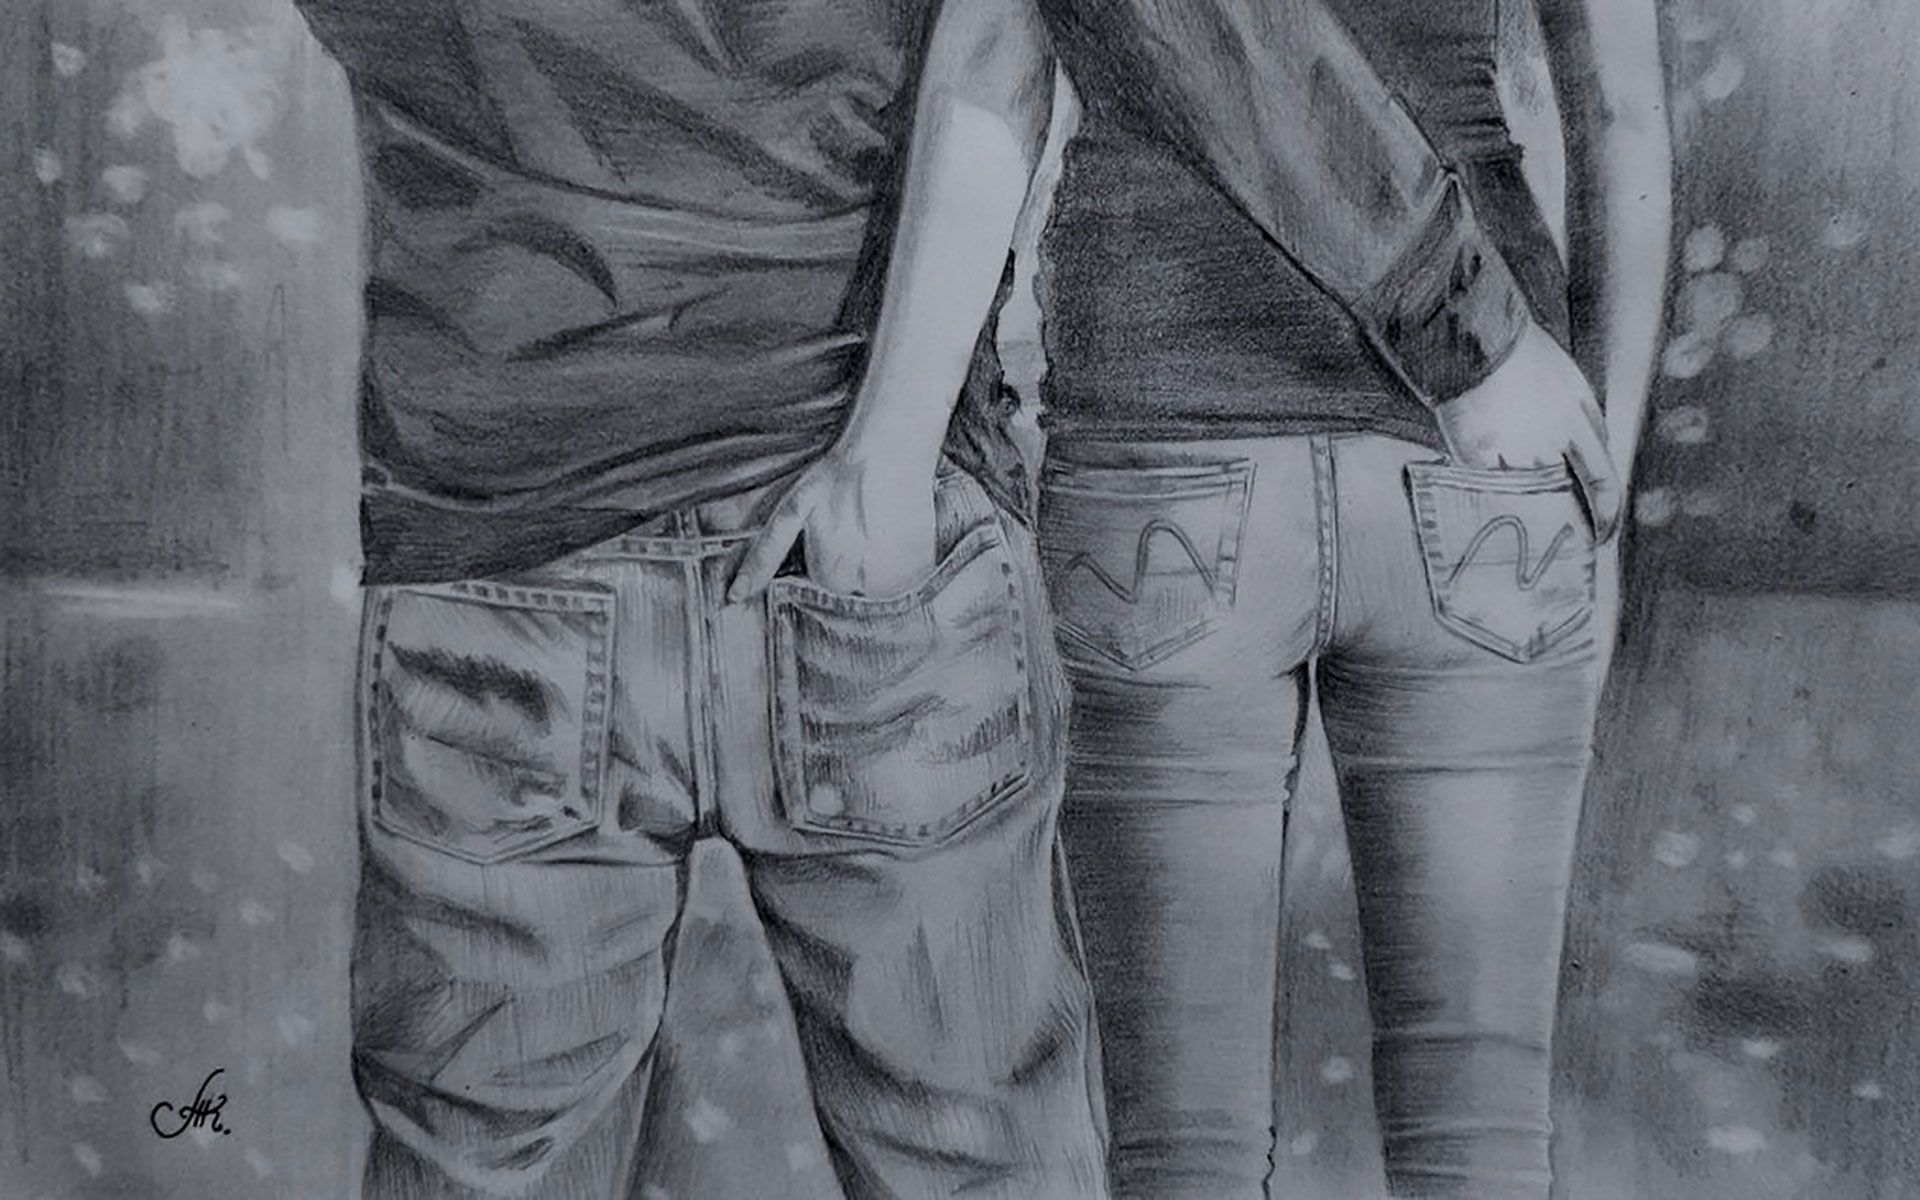 Cute Romantic Sketches Couple - HD Wallpaper